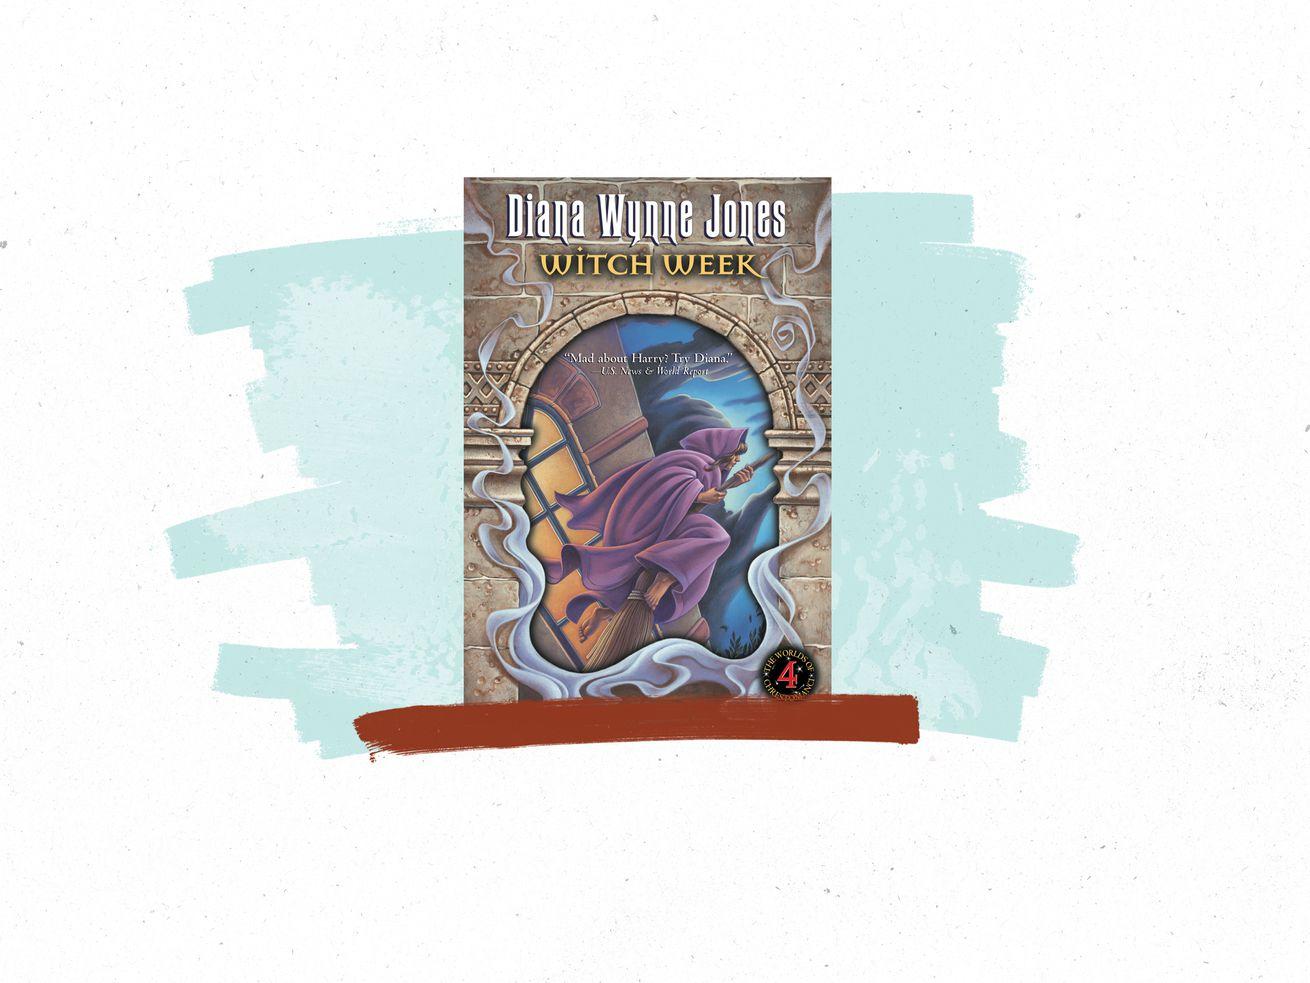 La couverture du livre de Diana Wynne Jones Witch Week.